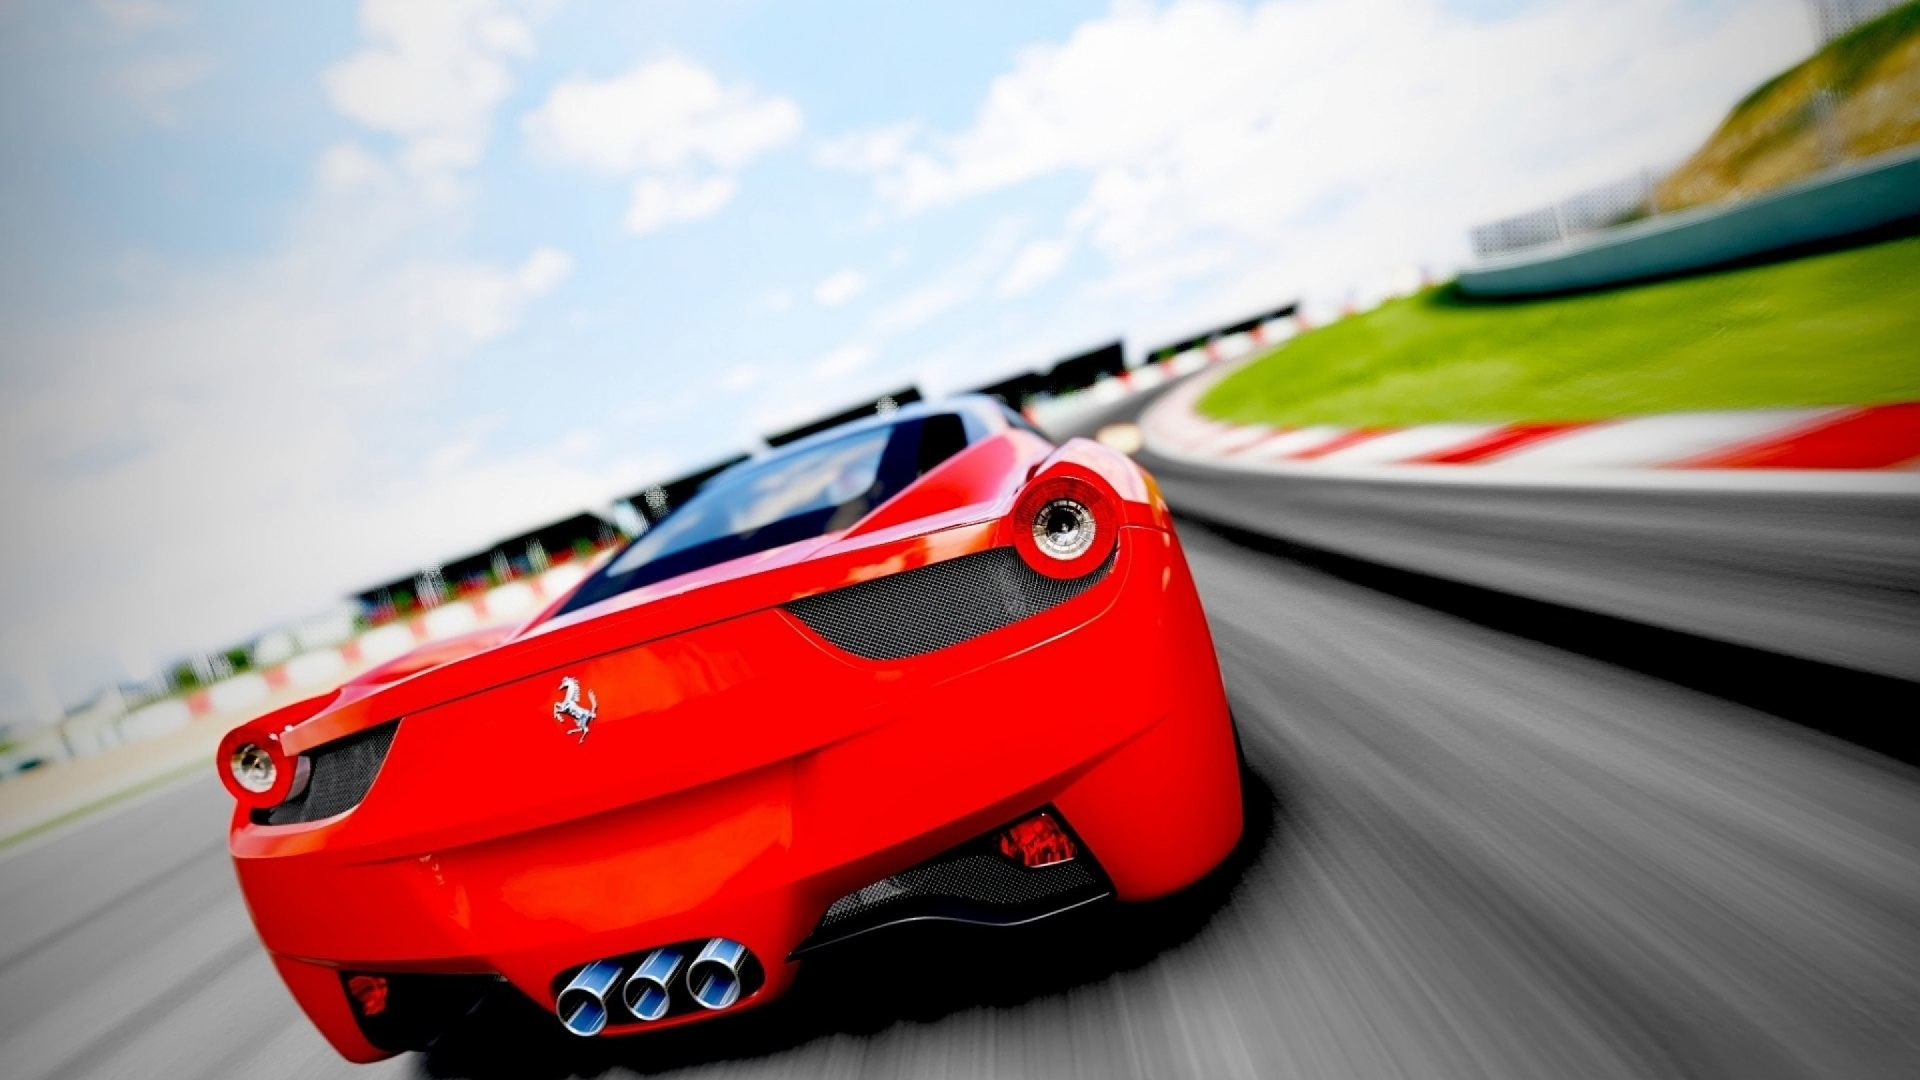 Gorgeous Red Ferrari 4k HD Wallpaper